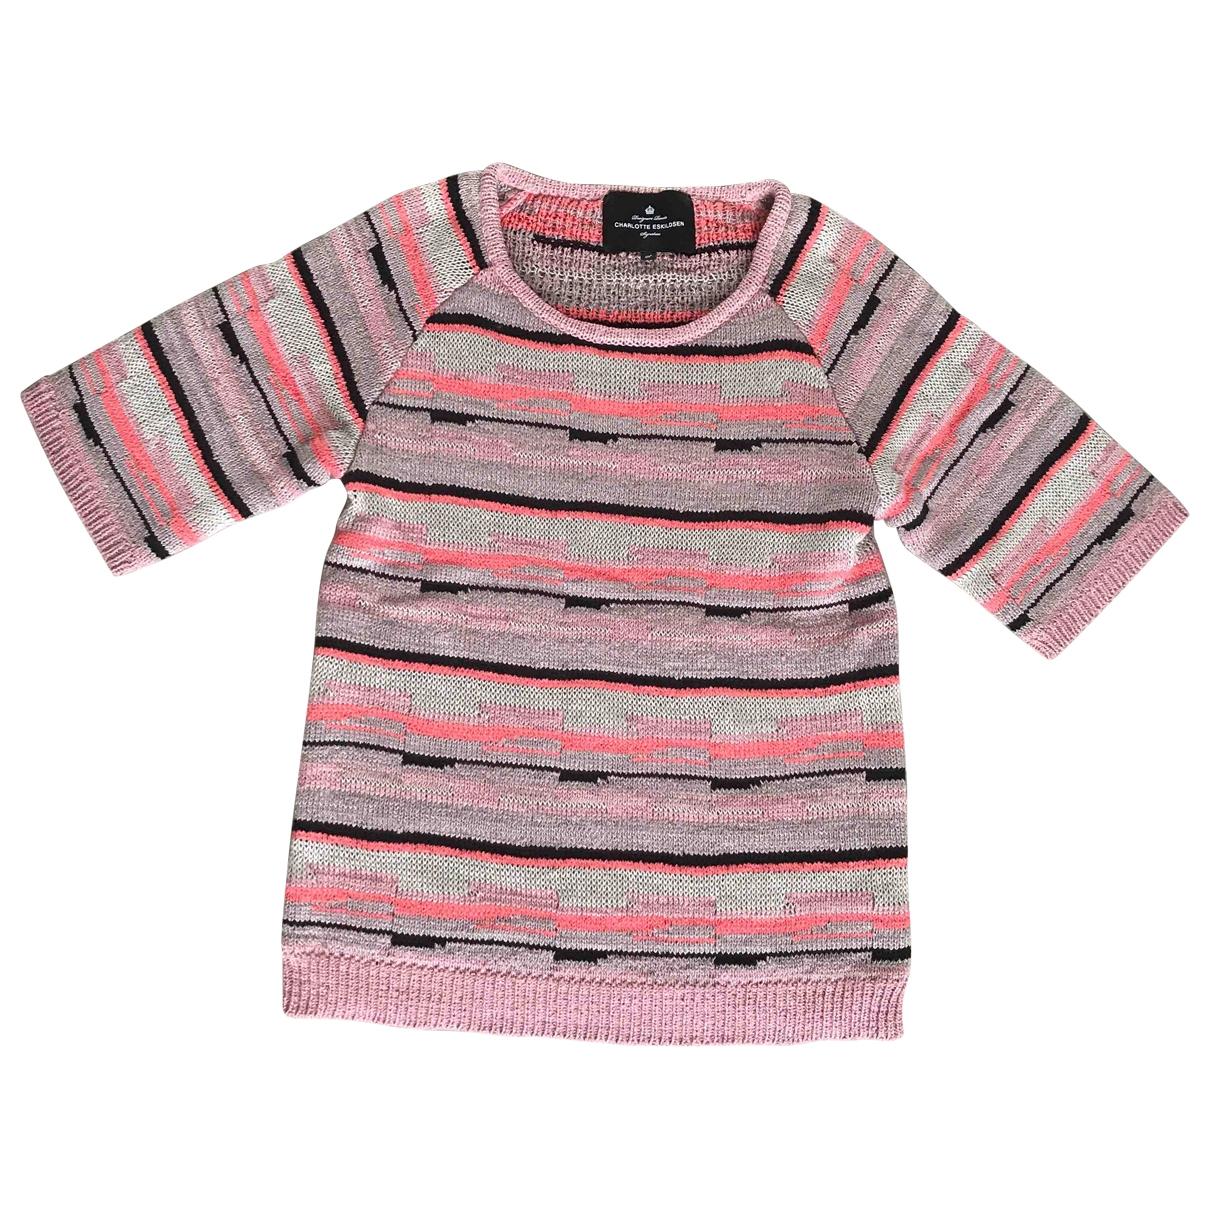 Designers Remix \N Multicolour Knitwear for Women S International